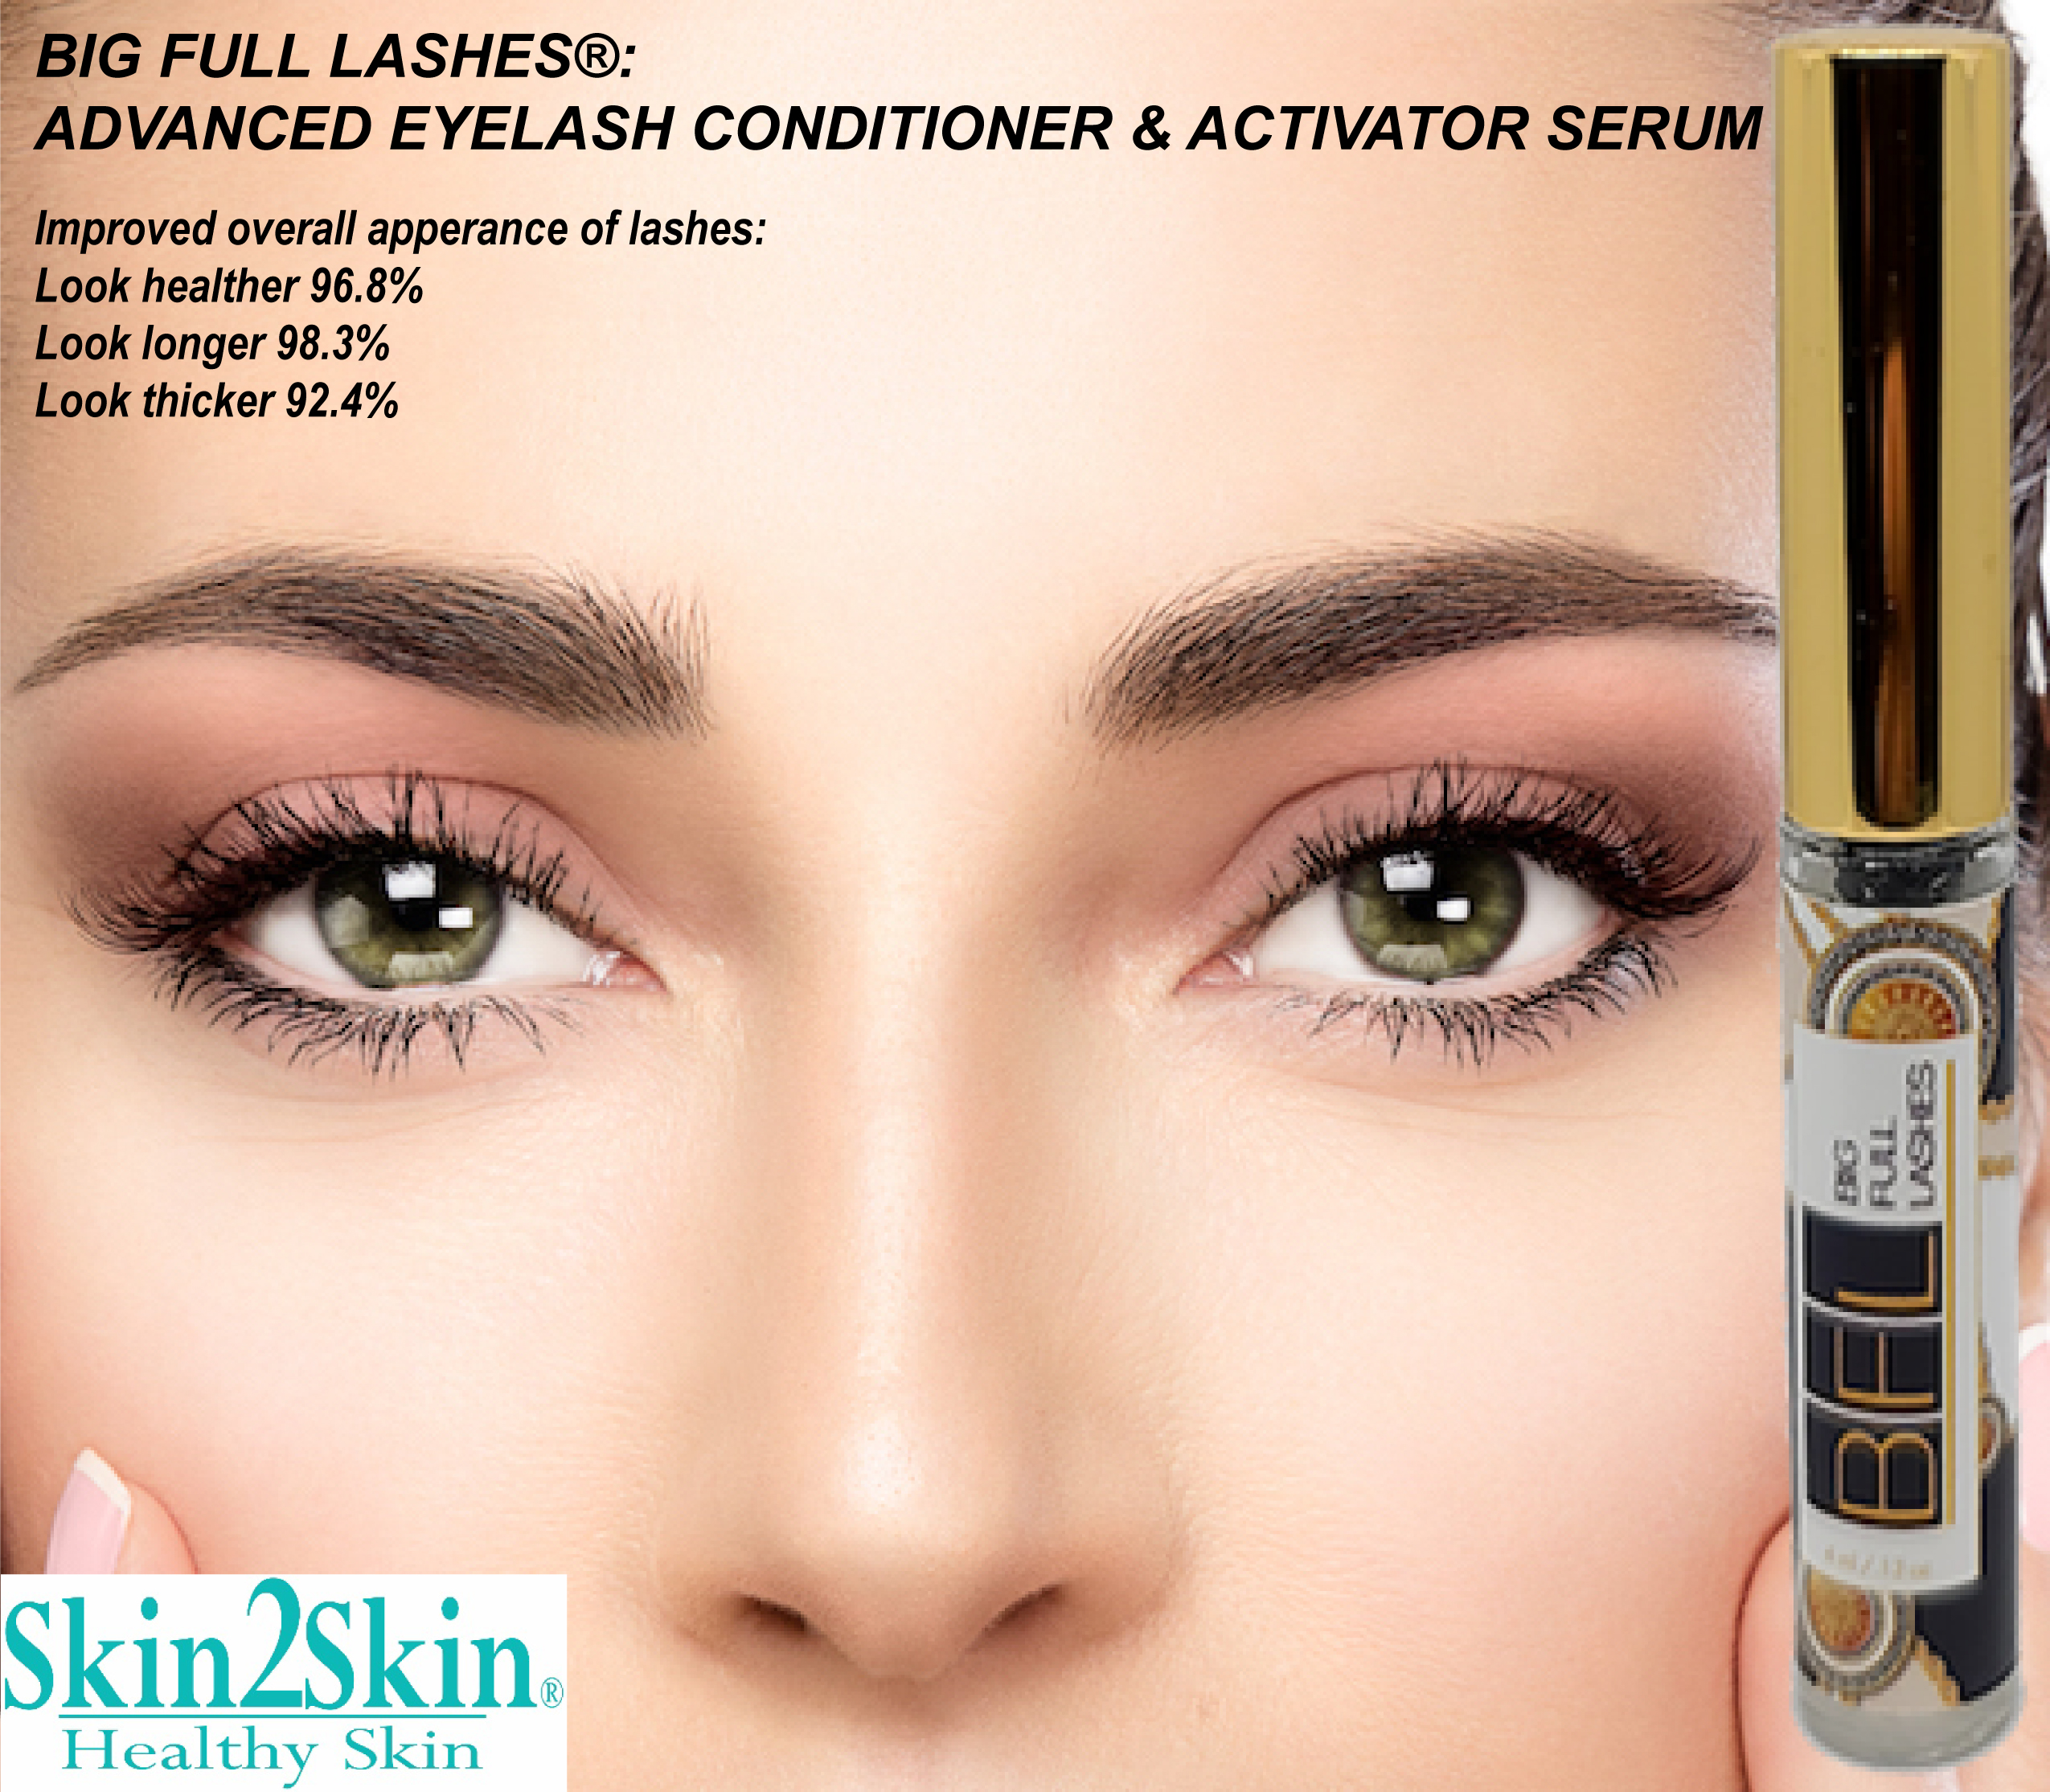 BFL - Big Full Lashes Women Skin2Skin